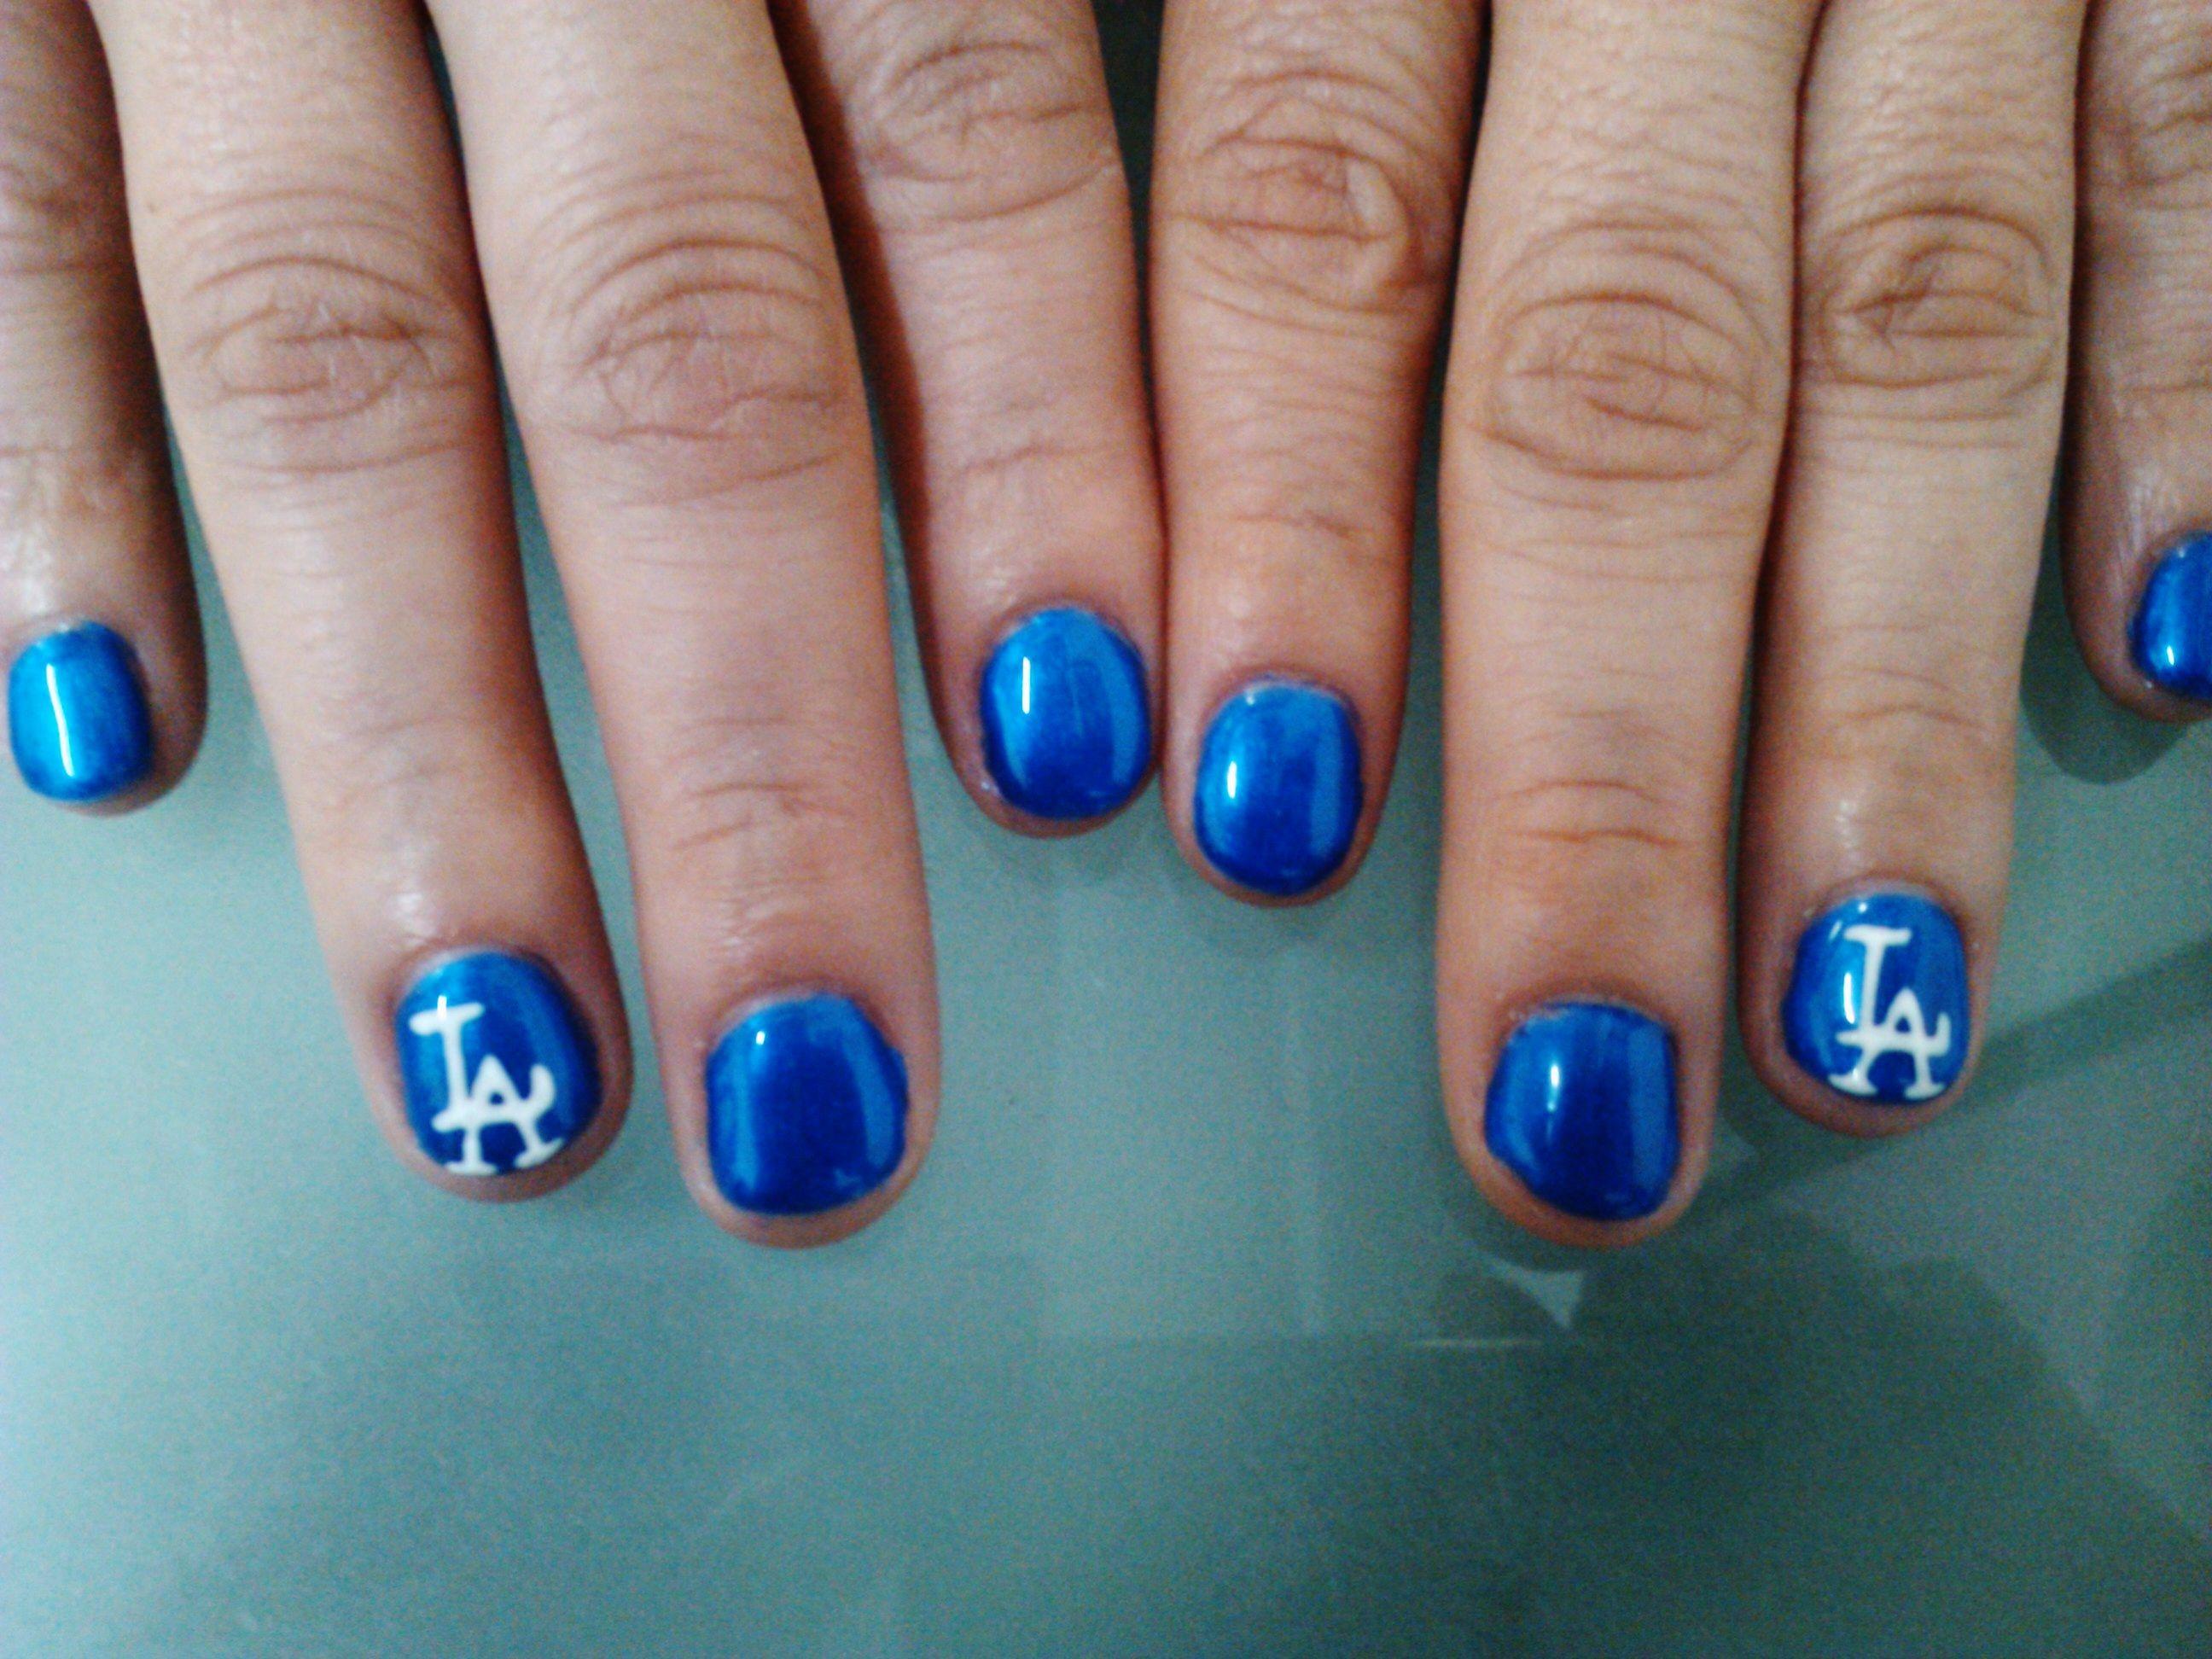 LA Doger fan <3 | LA | Pinterest | Fans and 3(